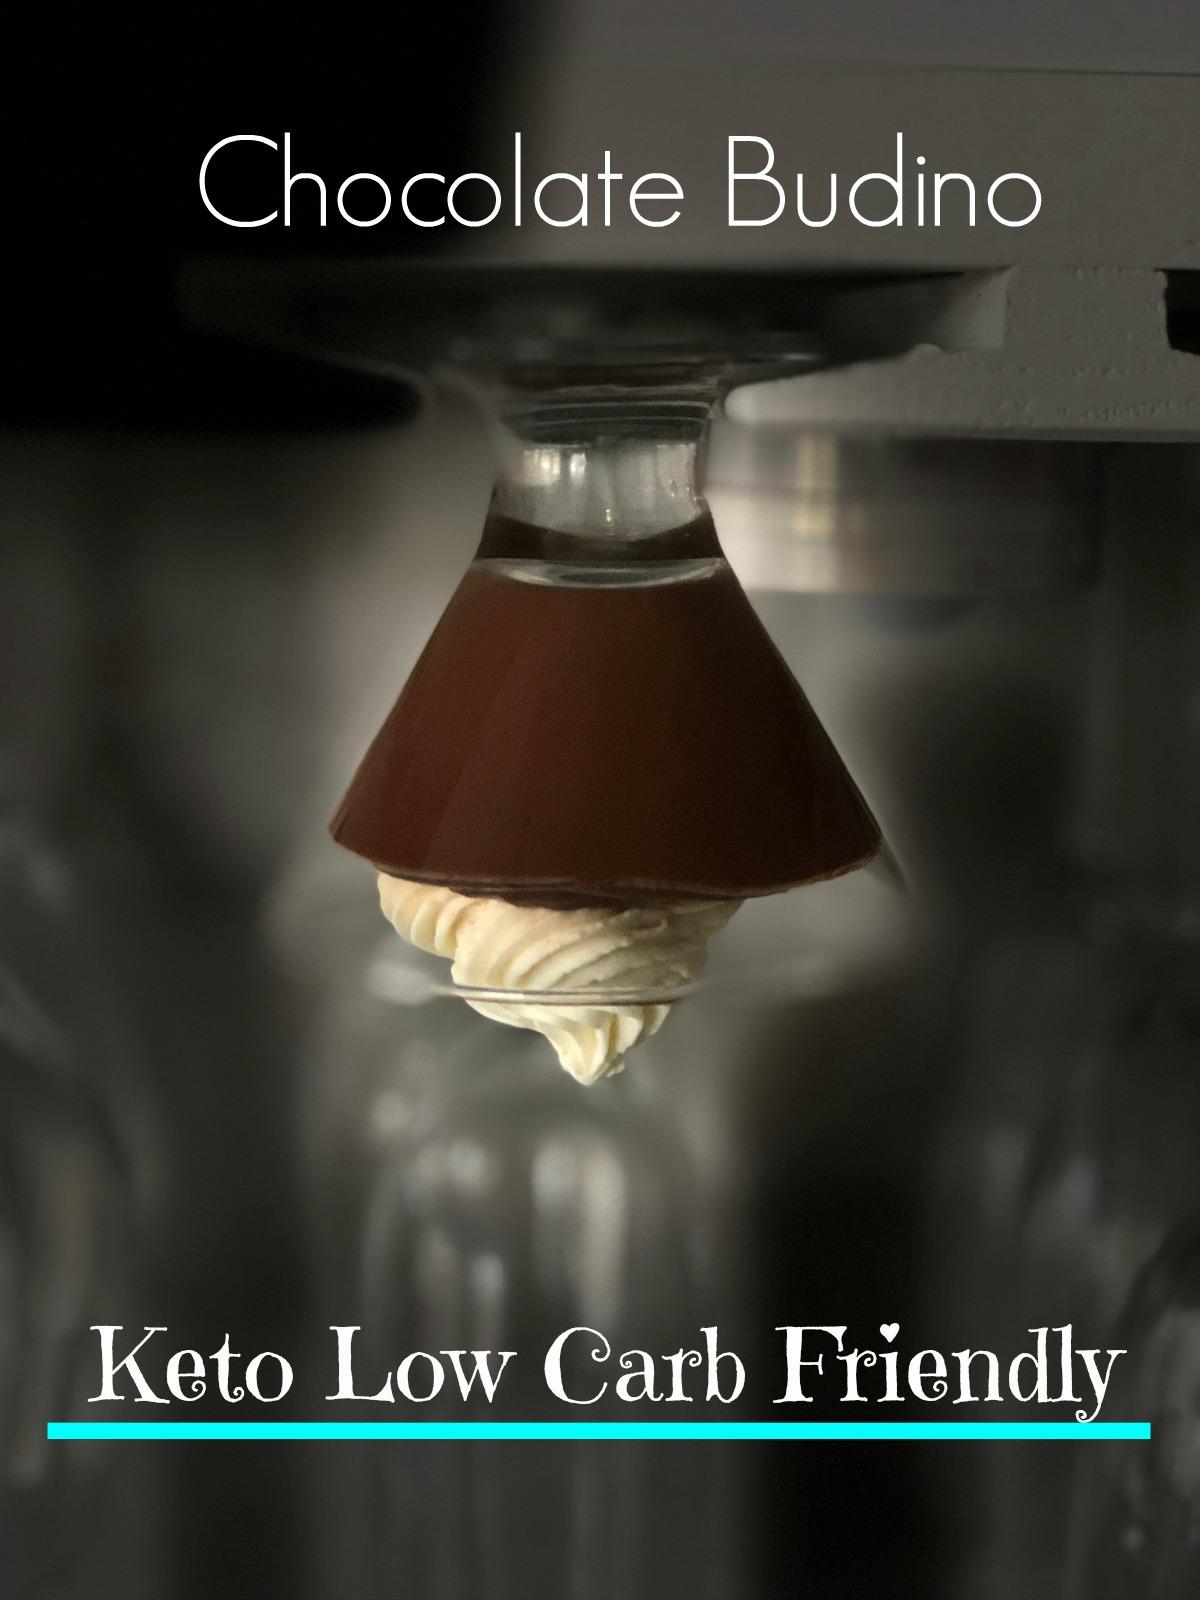 Keto Low Carb Sugar Free Chocolate Budino Recipe from Spinach Tiger